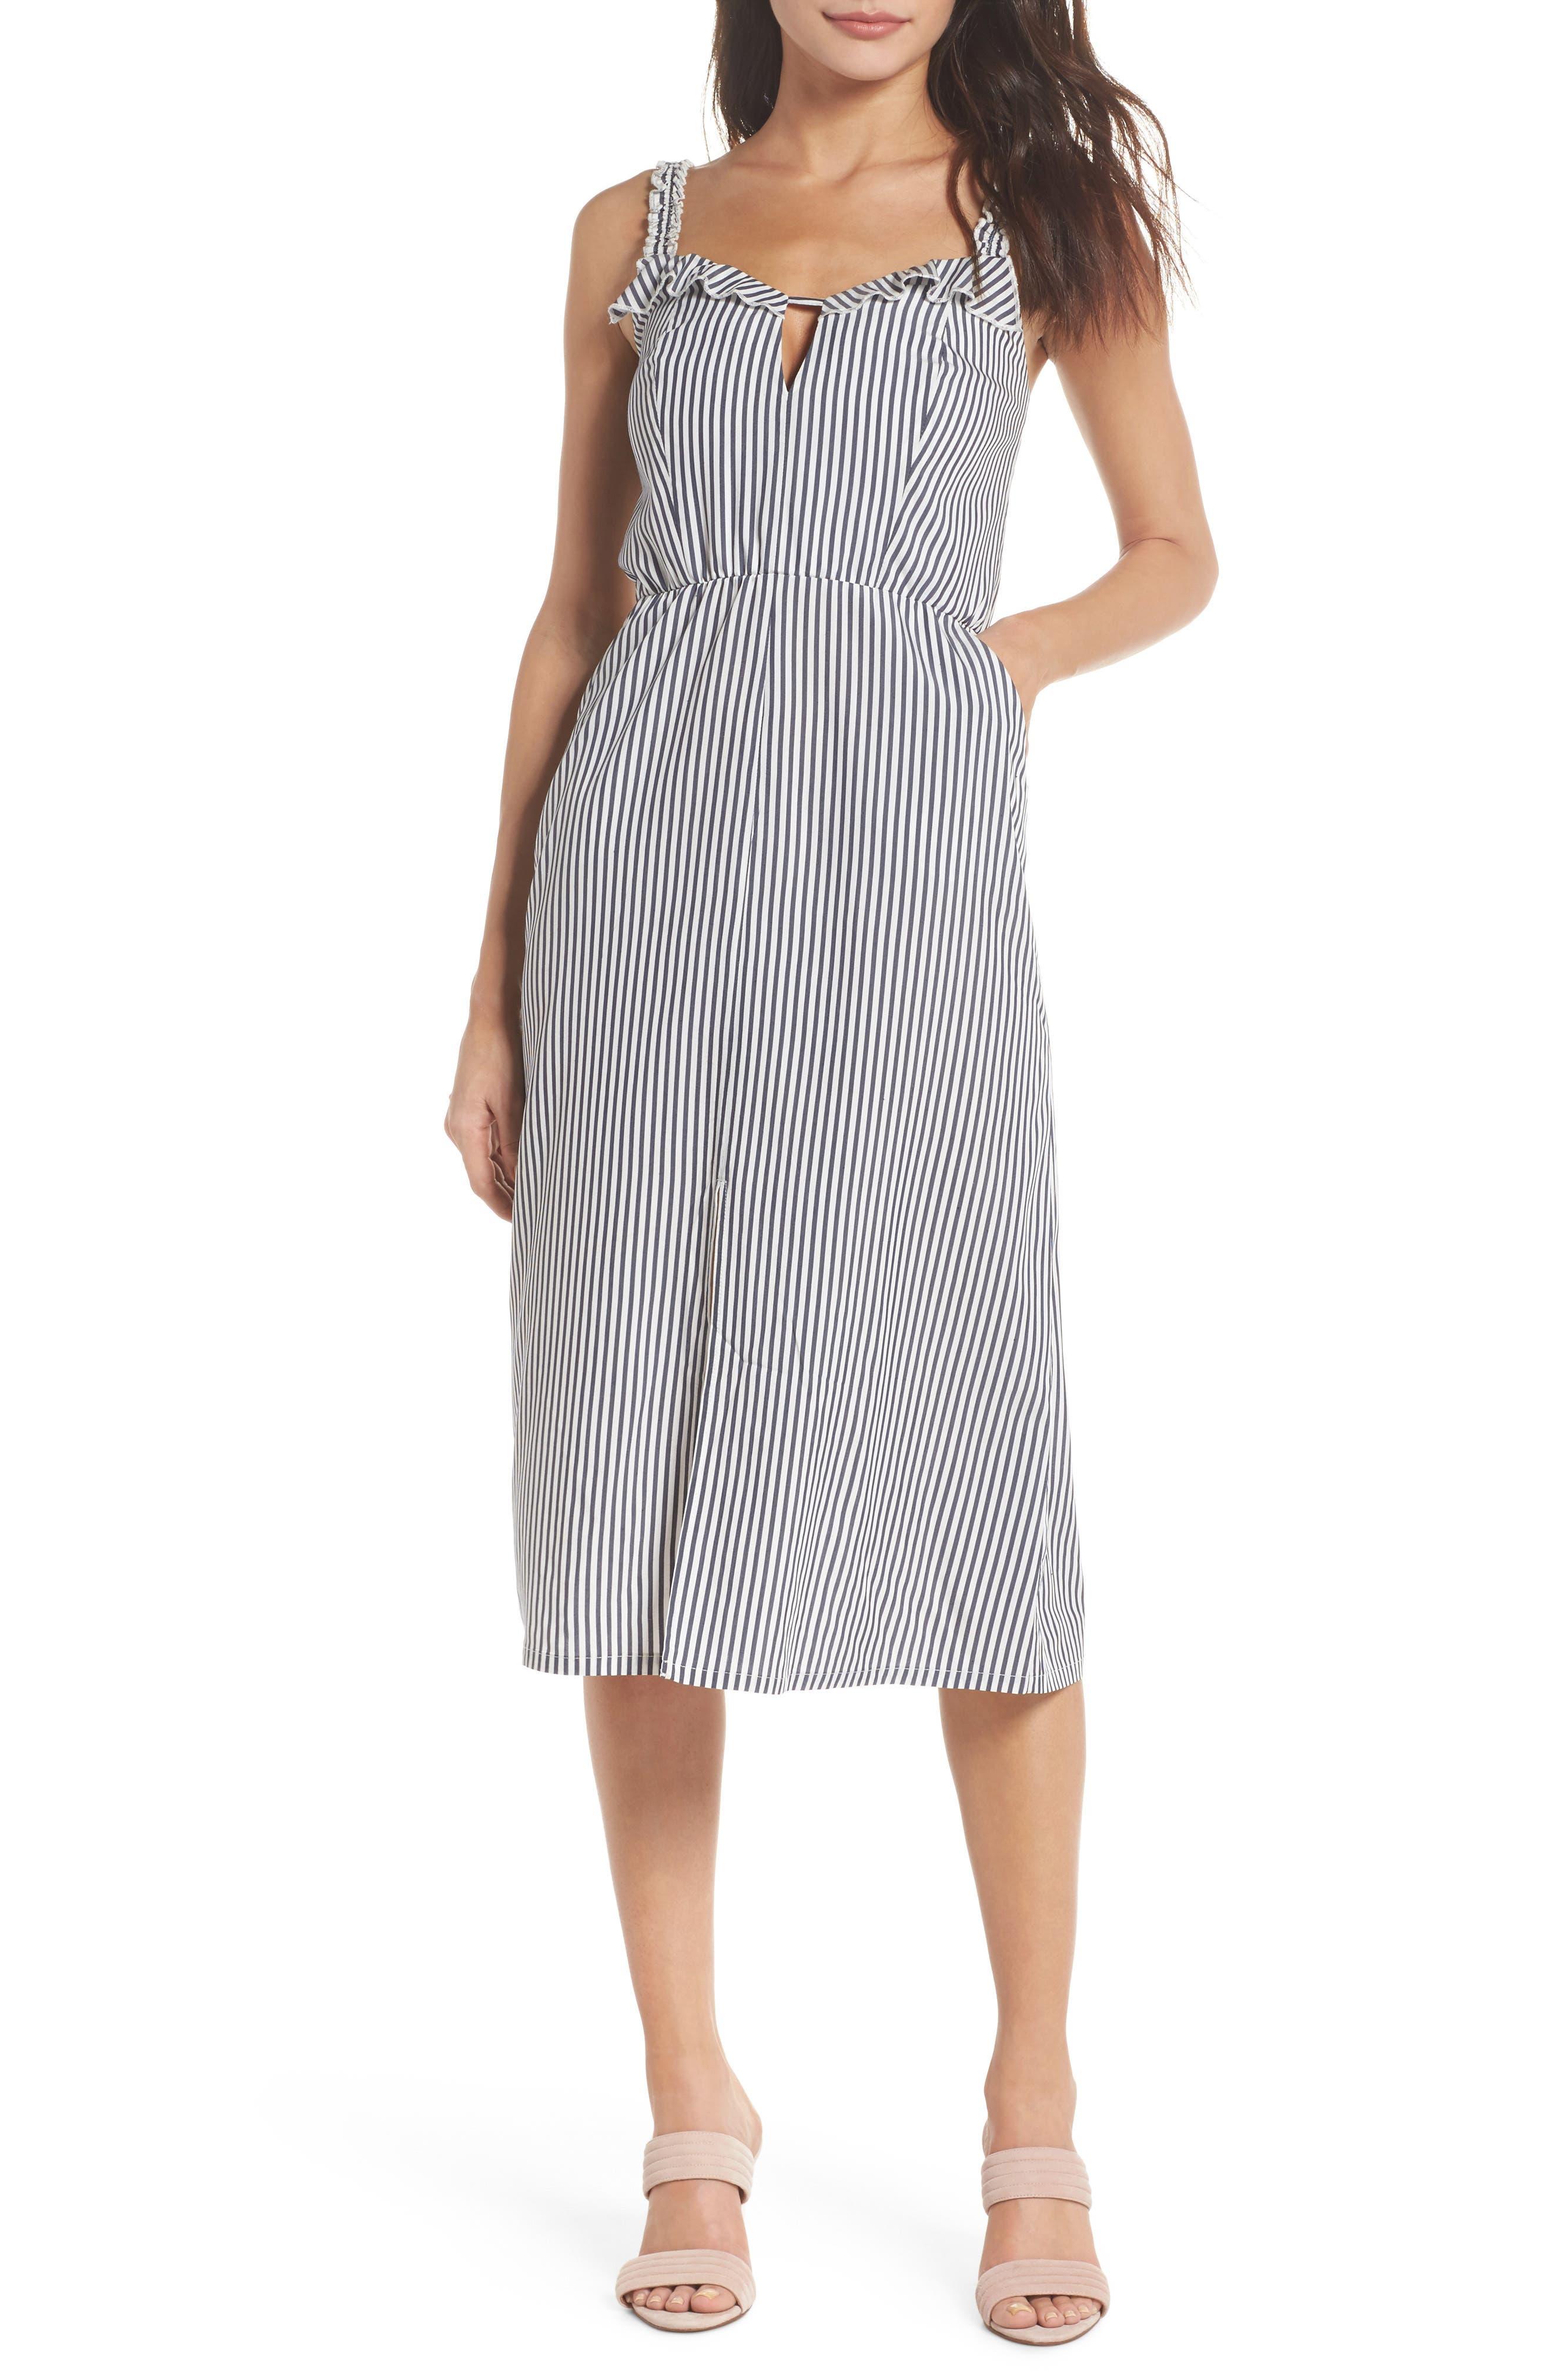 Drinks On Me Stripe Ruffle Midi Dress,                         Main,                         color, Navy/ White Mini Stripe